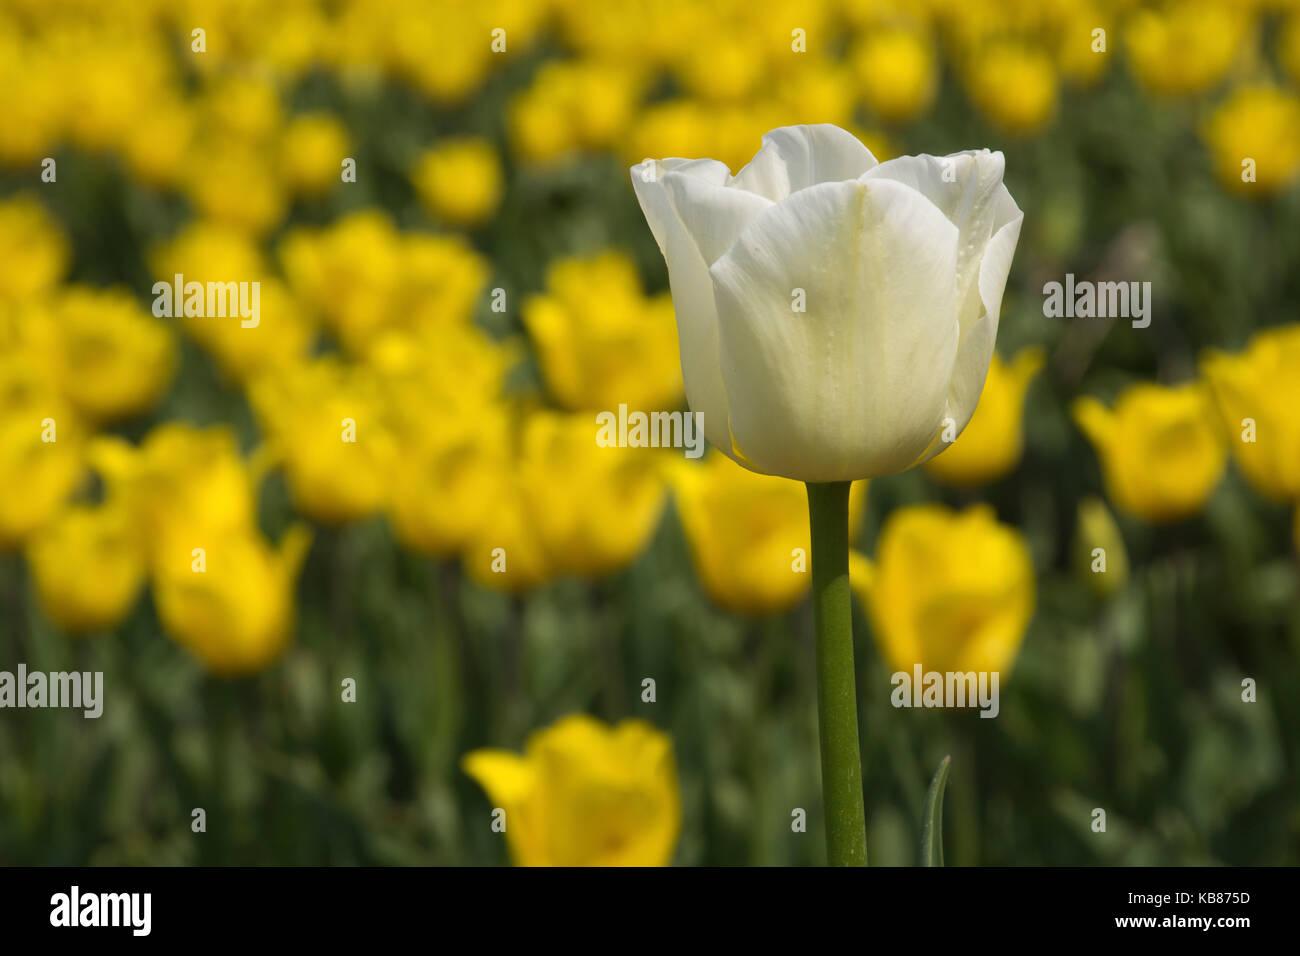 Lonely white tulip - Stock Image